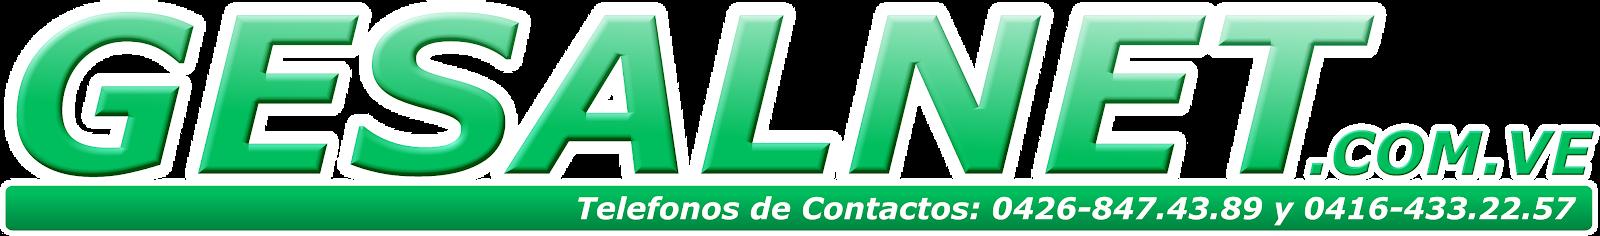 GESALNET.COM.VE - Gestoria - Inmobiliaria - Asesor Legal